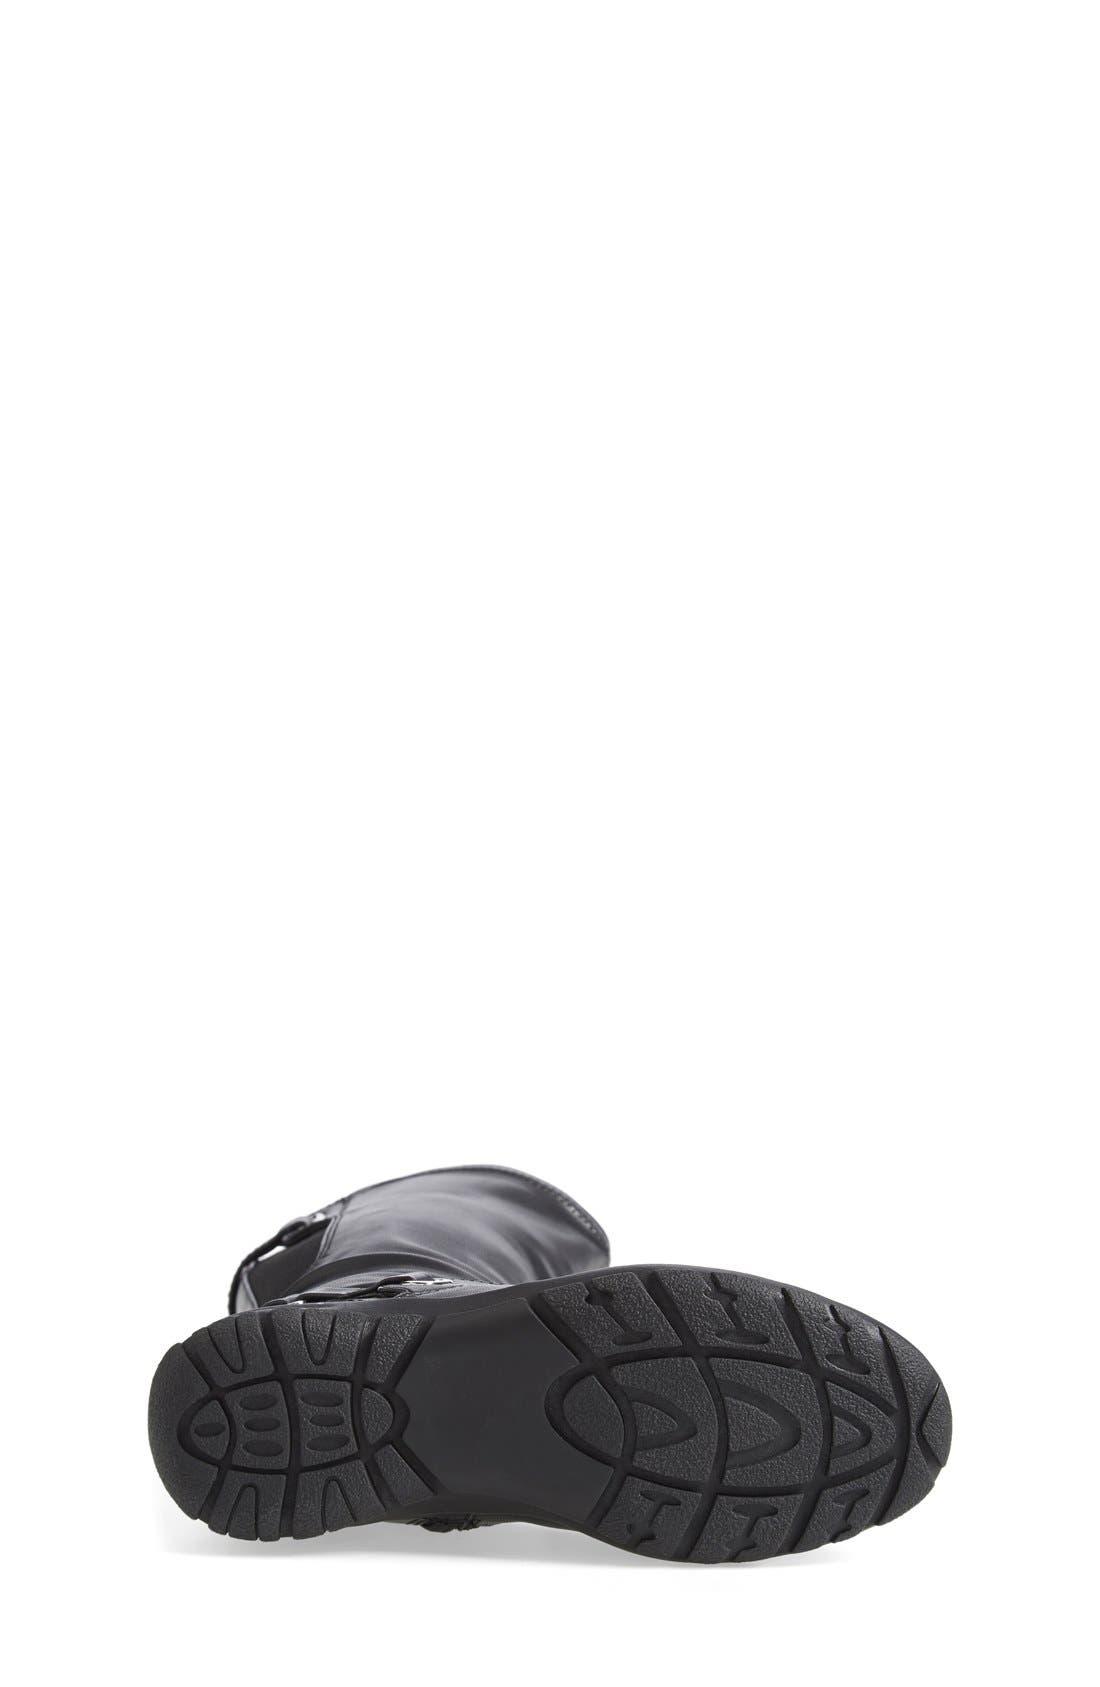 Alternate Image 4  - Nordstrom 'Tate' Boot (Walker, Toddler, Little Kid & Big Kid)